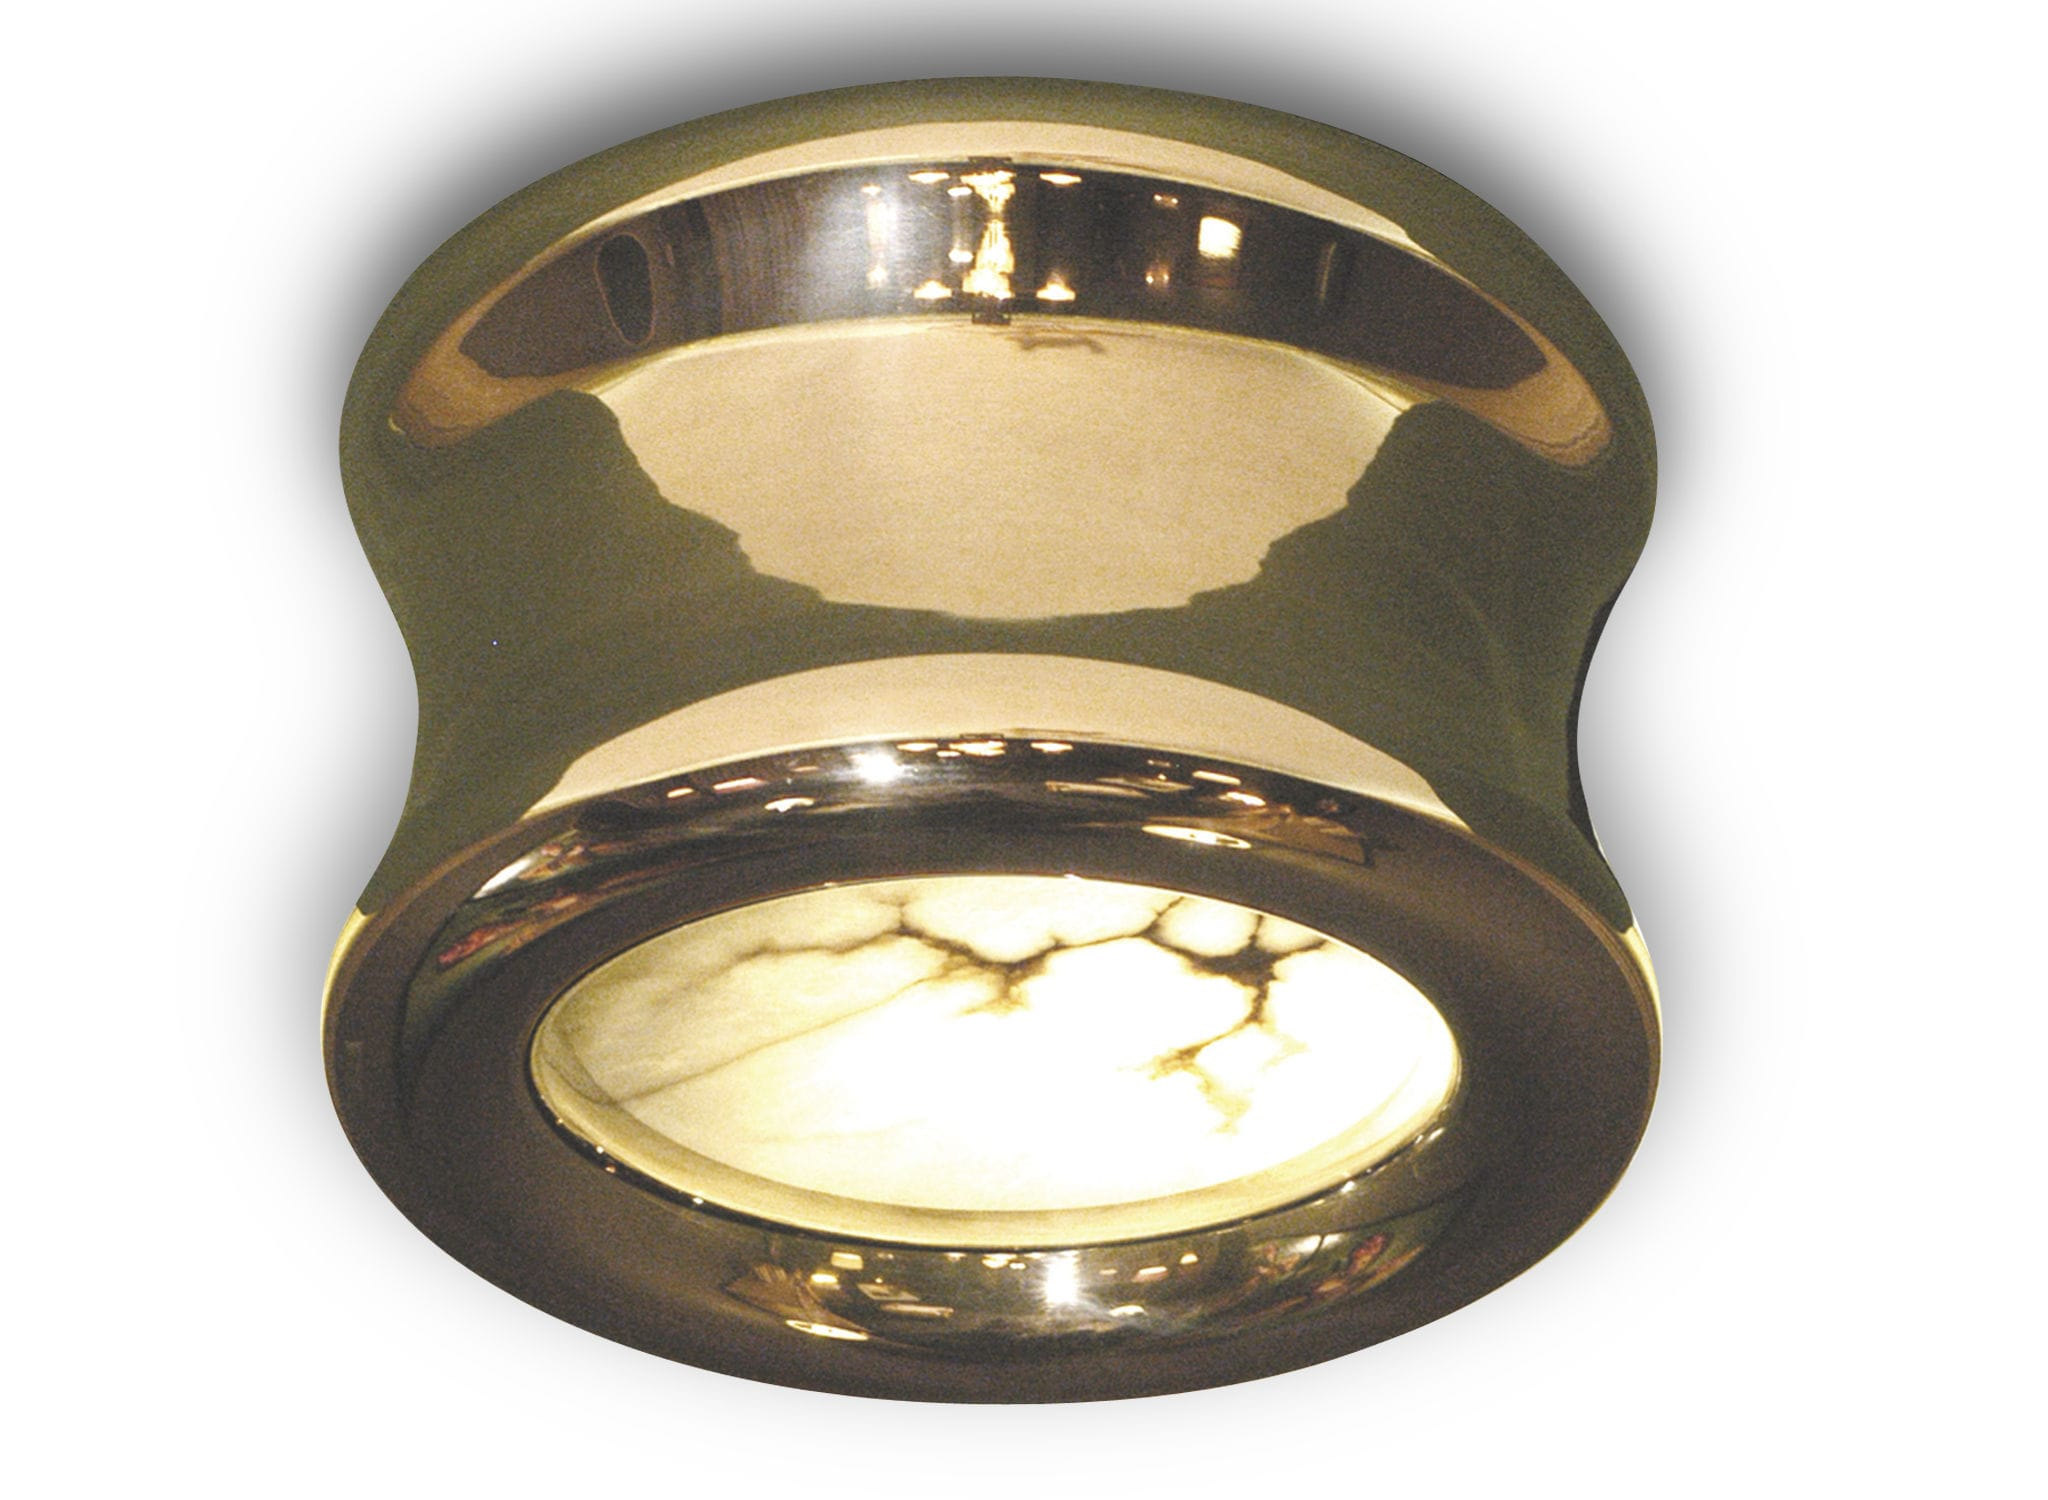 Plafoniere Tonde Da Interno : Plafoniera moderna tonda in metallo da interno roshaan i